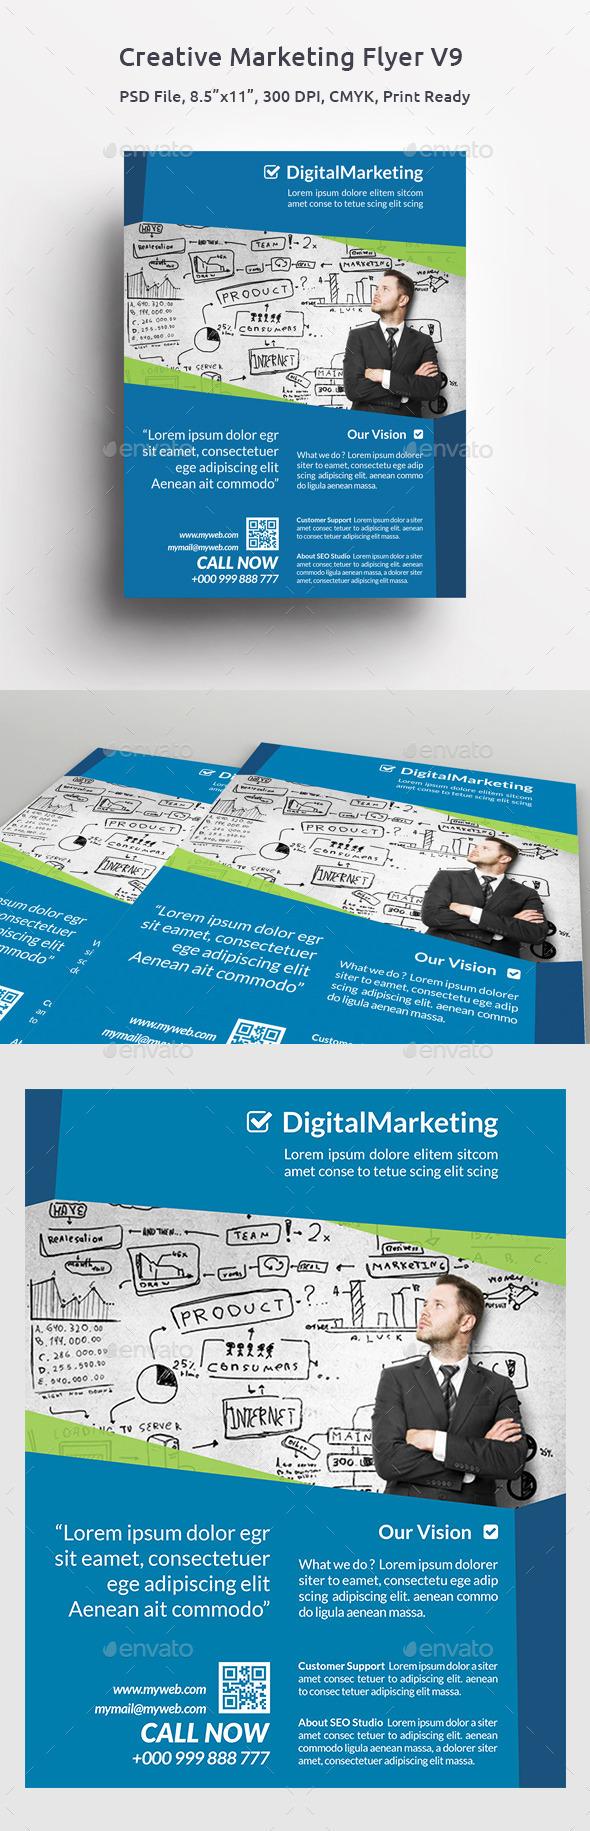 GraphicRiver Creative Marketing Flyer V9 11493065